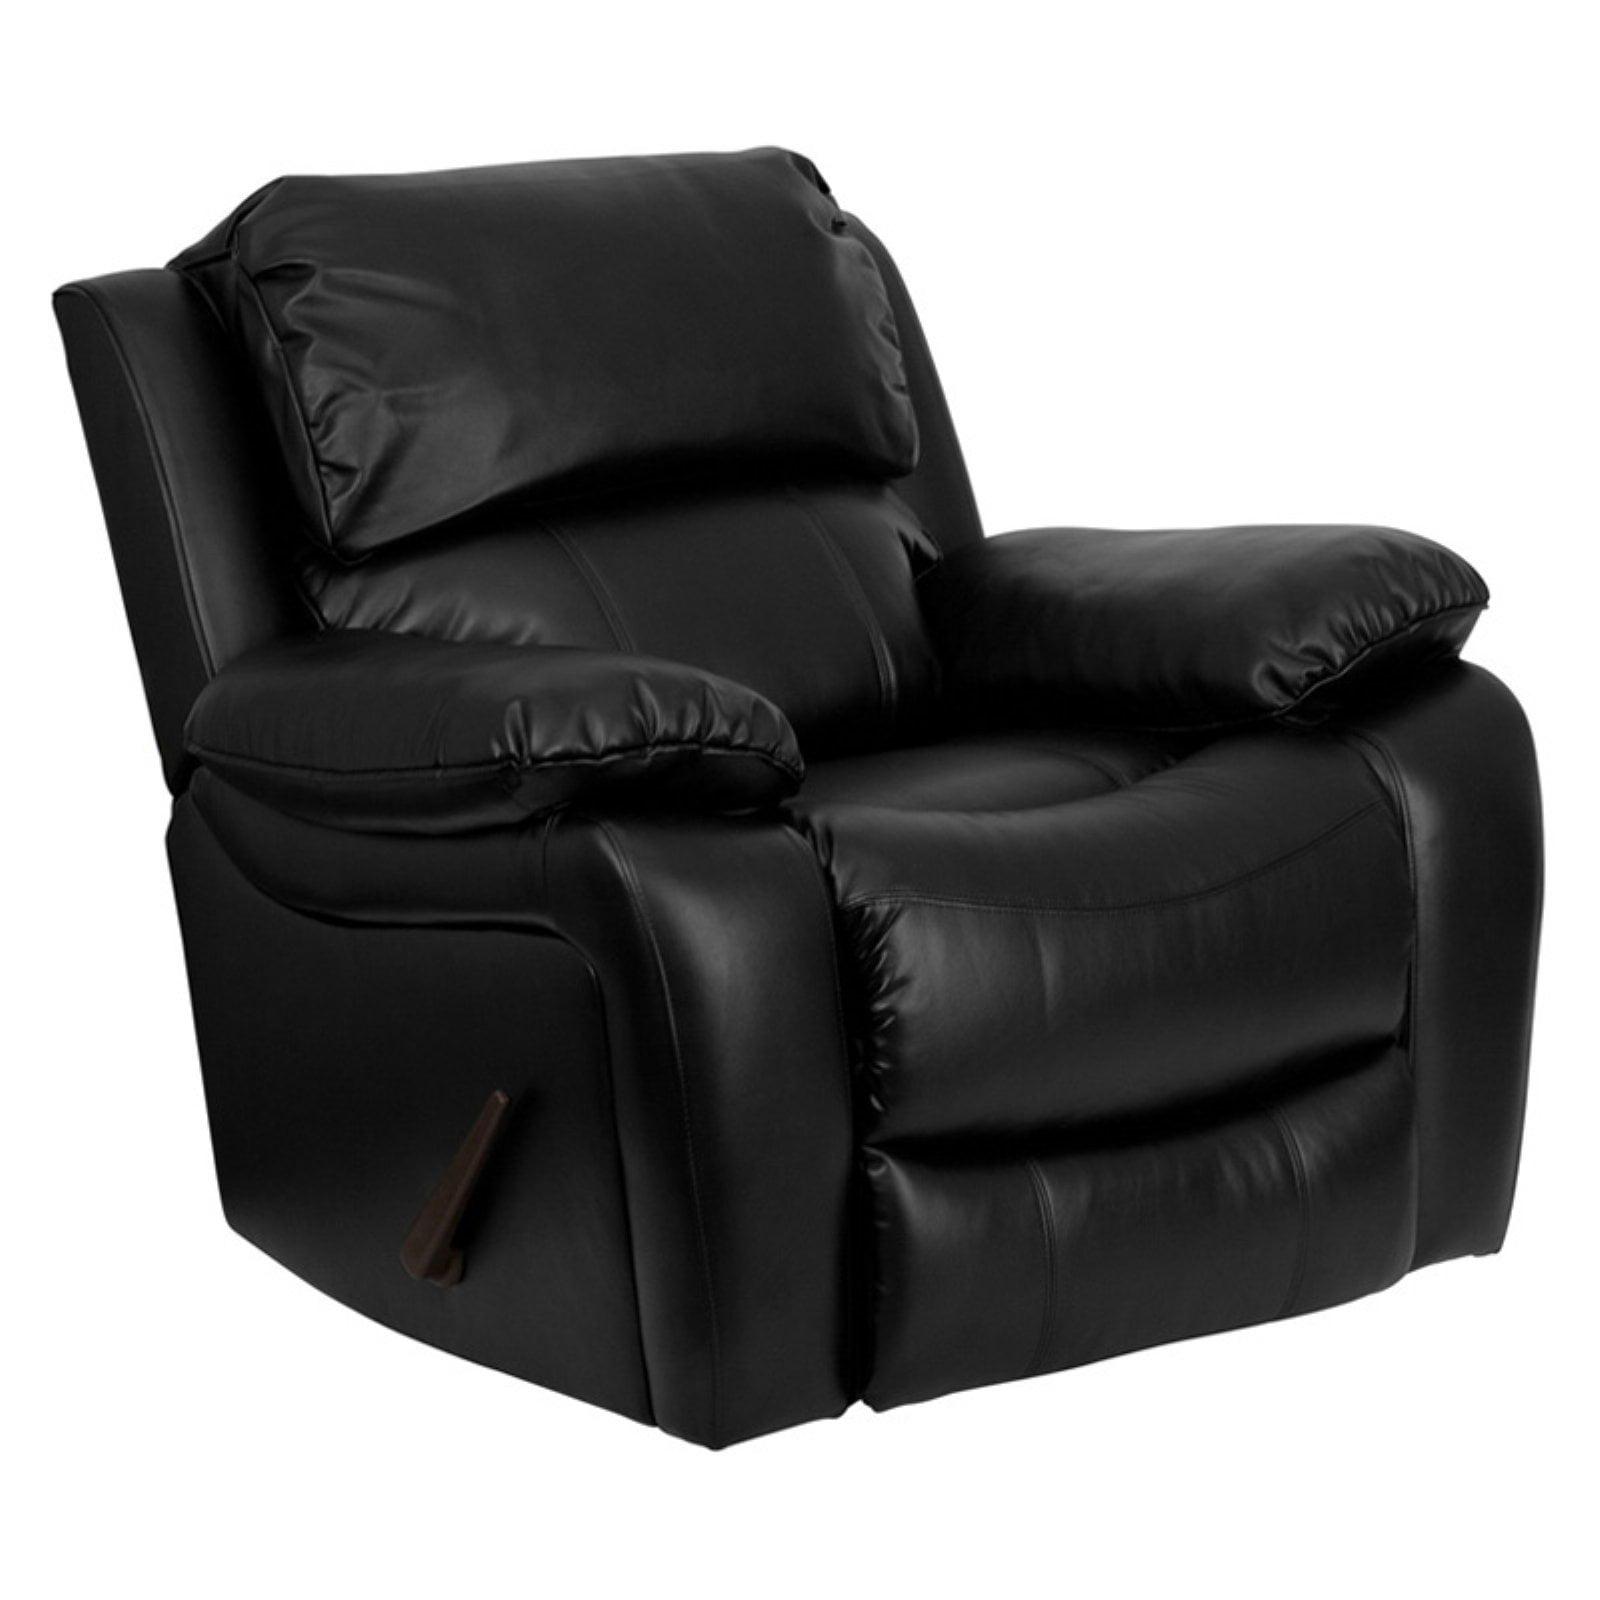 Flash Furniture Leather Rocker Recliner Multiple Colors Walmart